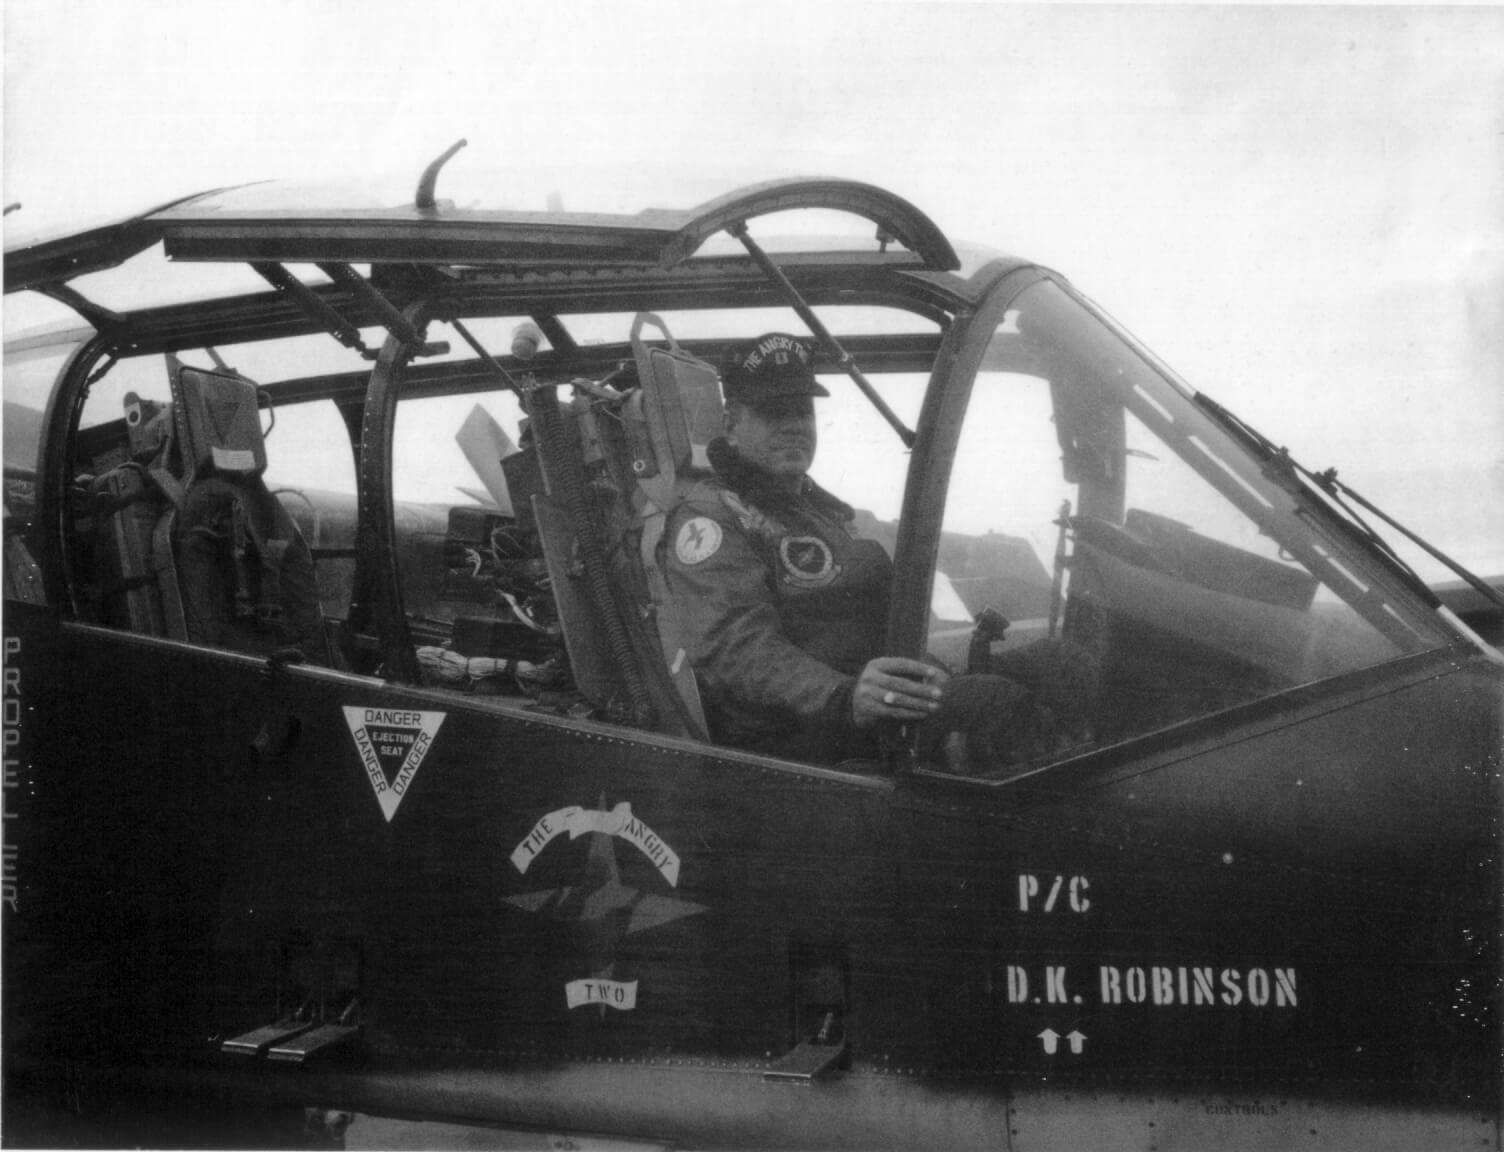 Pilot in aircraft